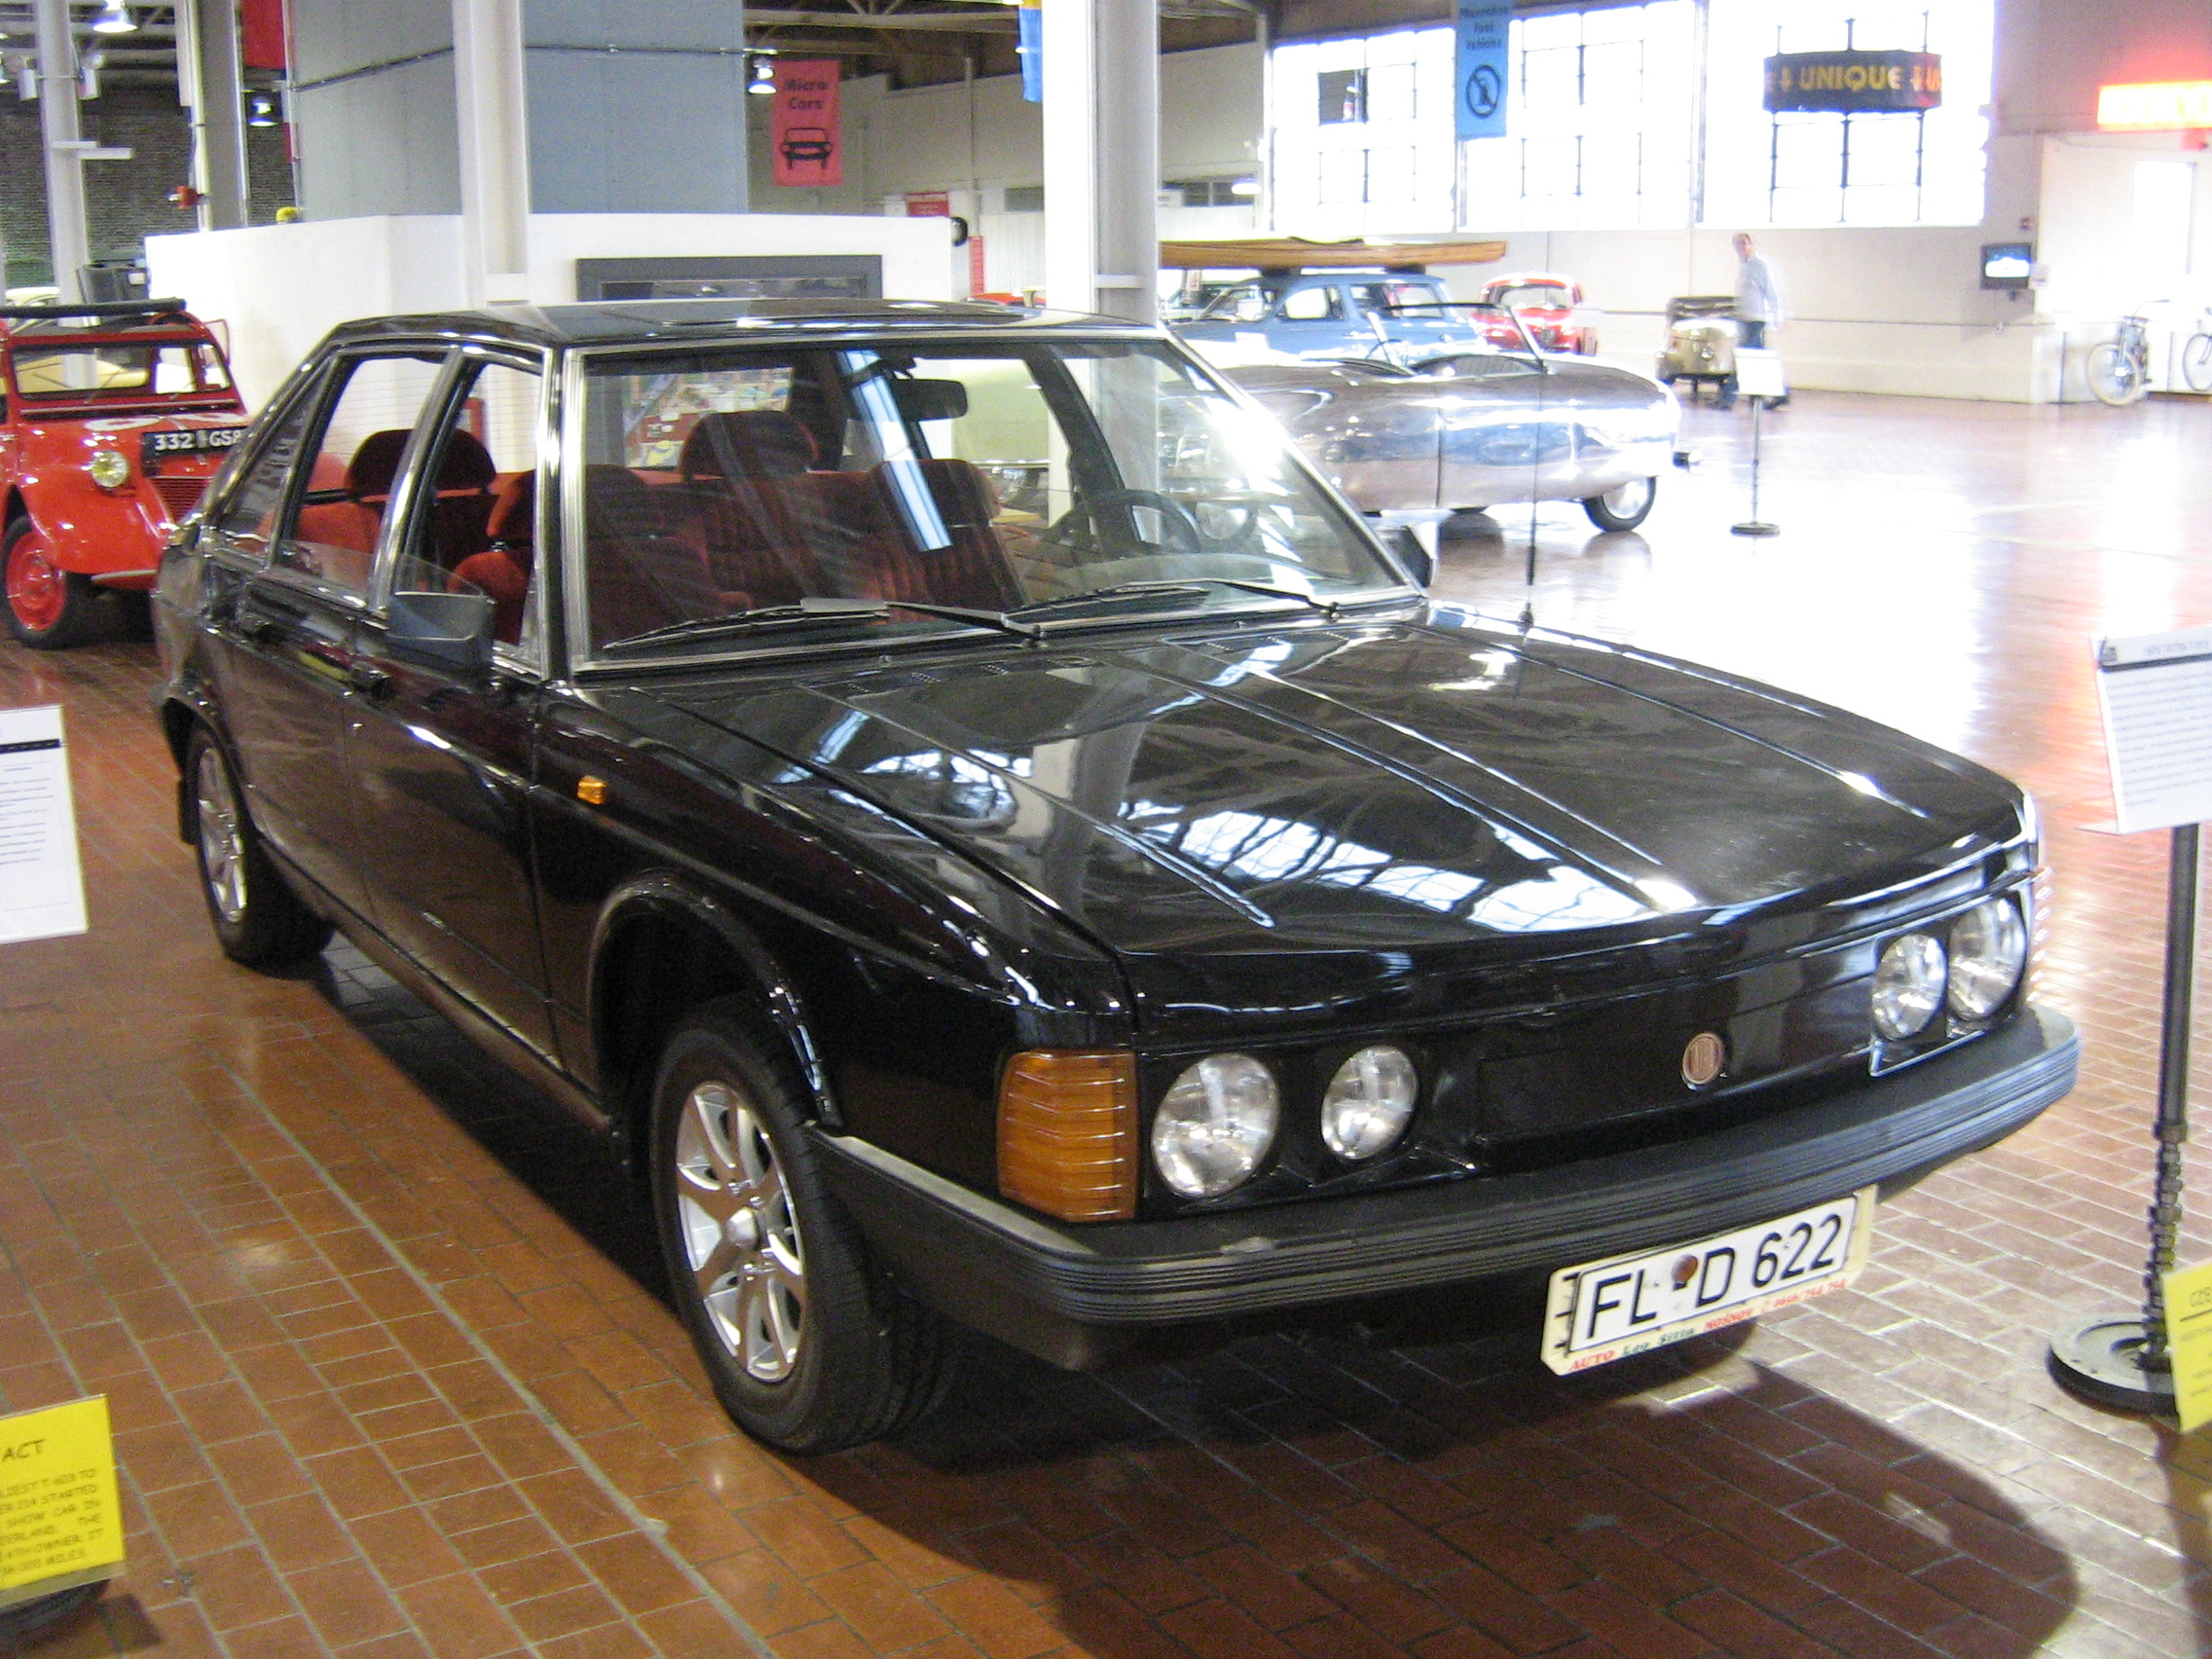 Tatra 613-4. (PIcture courtesy Wikimedia)